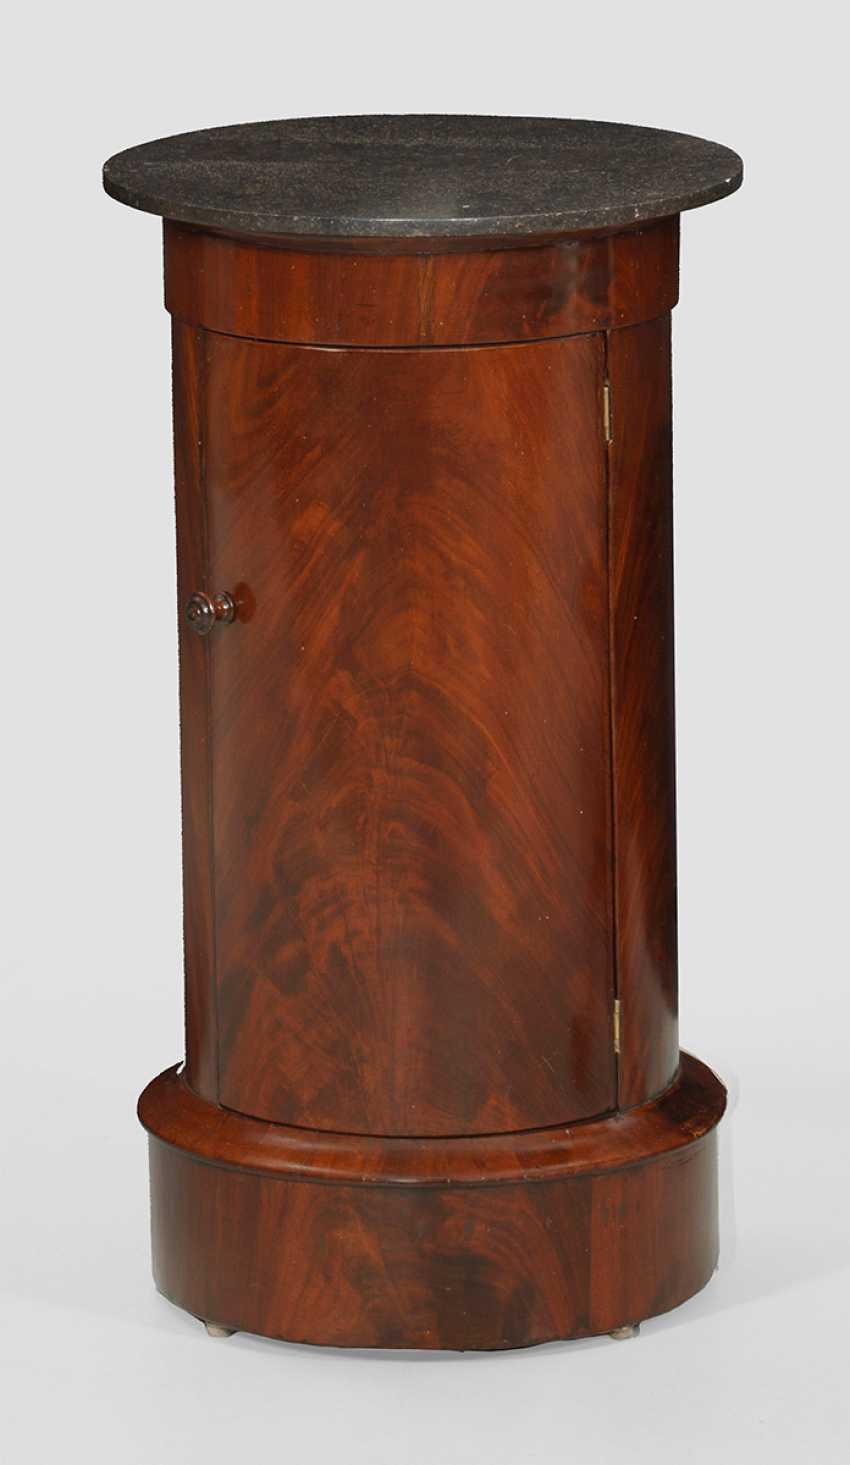 Biedermeier-Style Drum Cabinets - photo 1